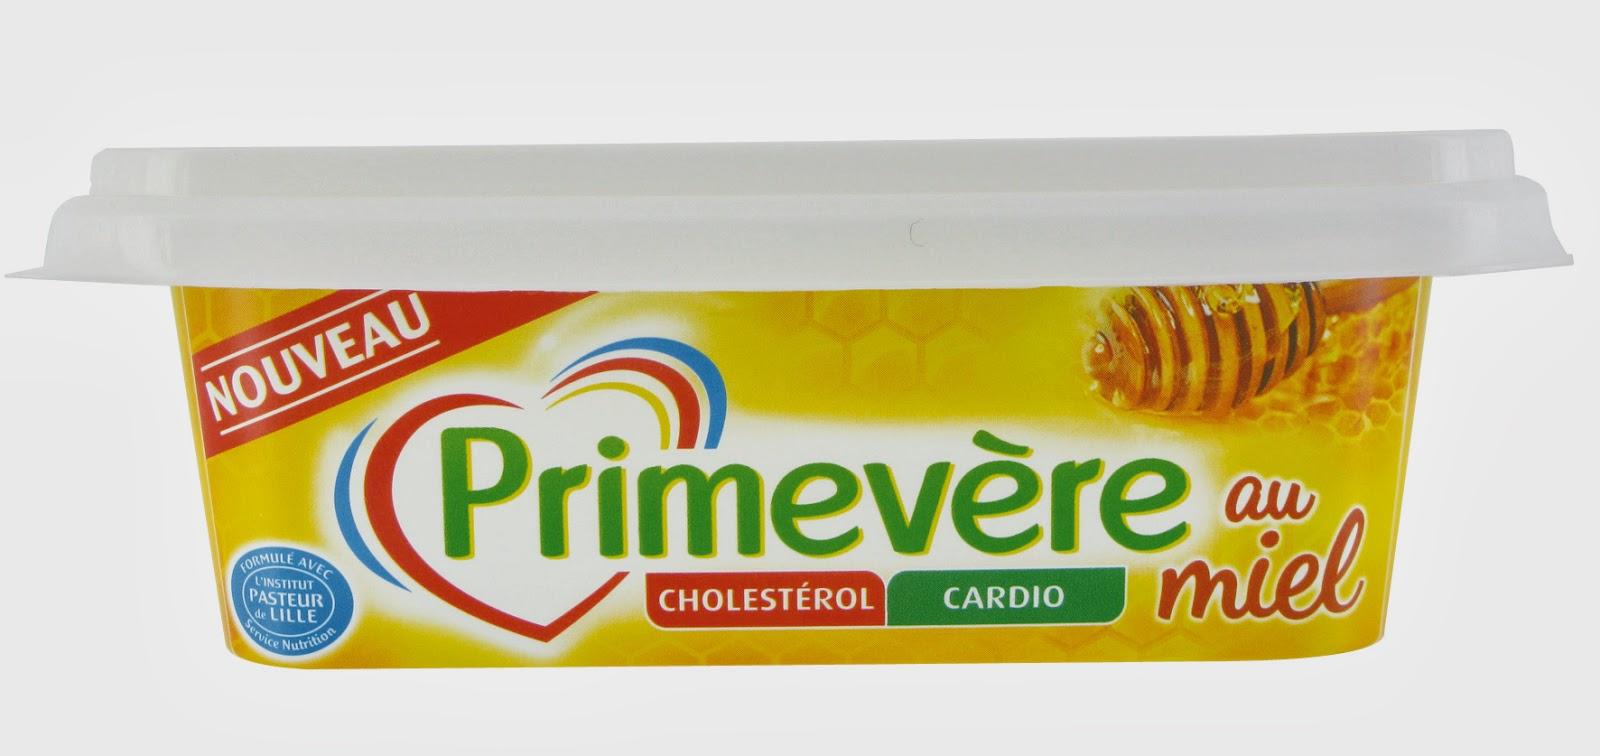 http://primevere.com/primevere-miel/primevere-miel.html?utm_source=Aux%20d%C3%A9lices%20de%20G%C3%A9raldine&utm_medium=article&utm_term=miel&utm_campaign=Primevere_miel